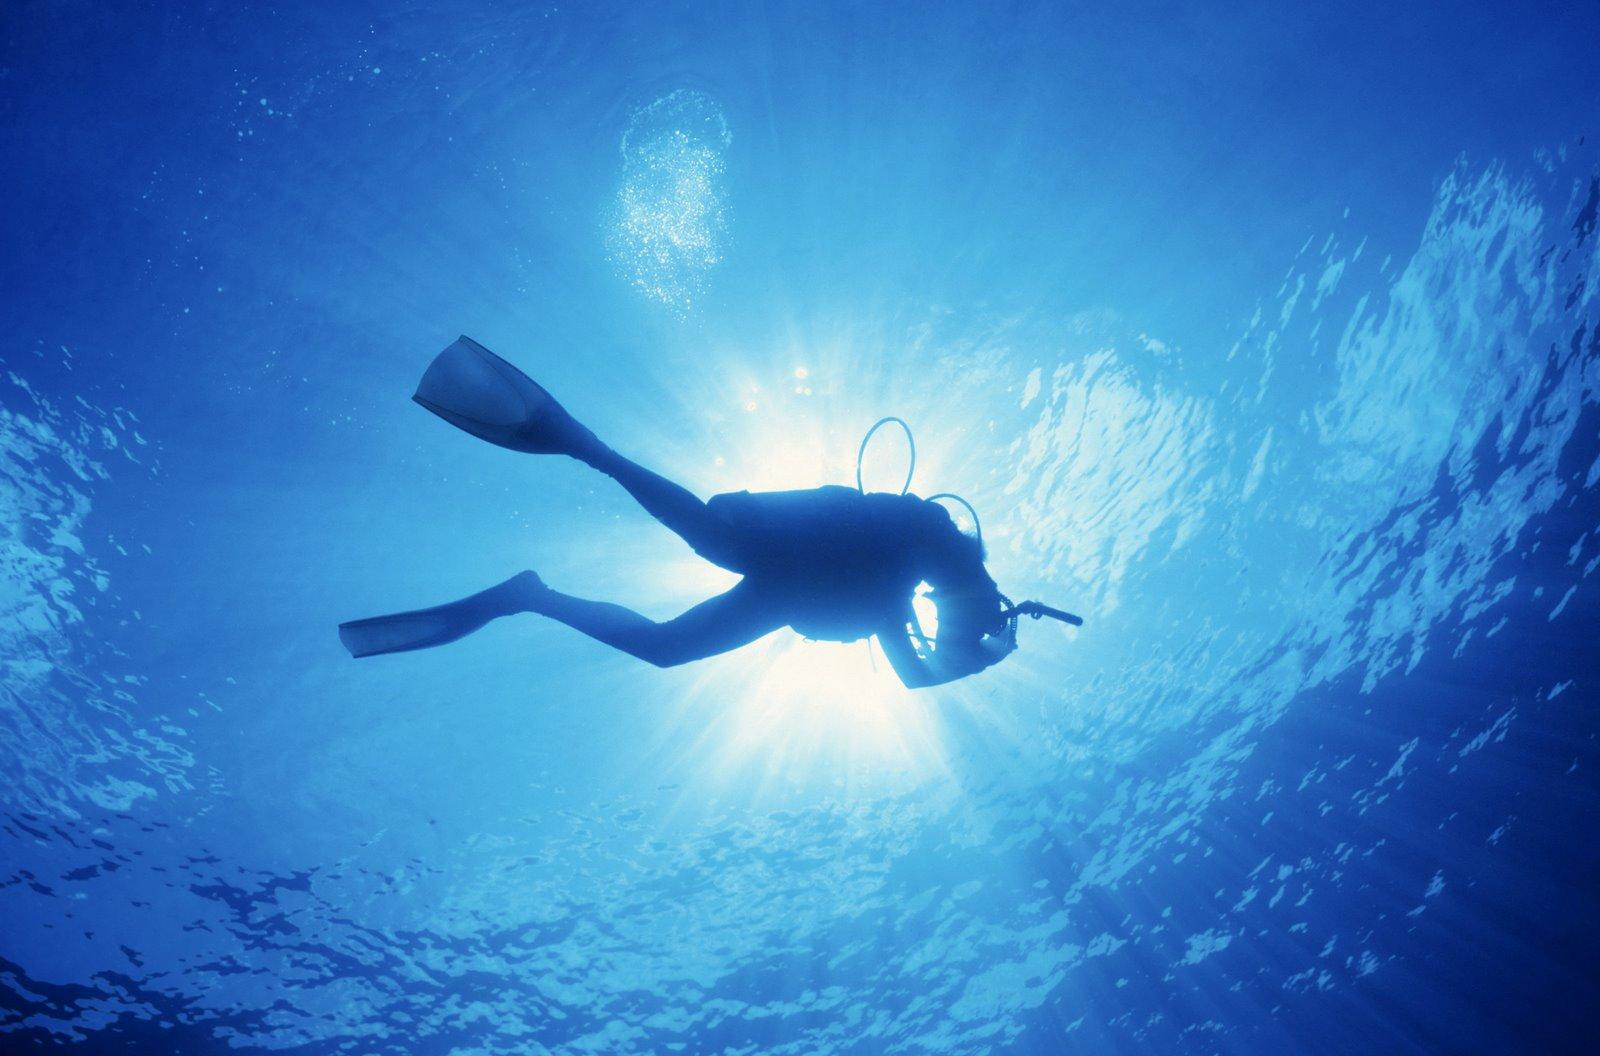 scuba diving wallpaper wallpapers - photo #5